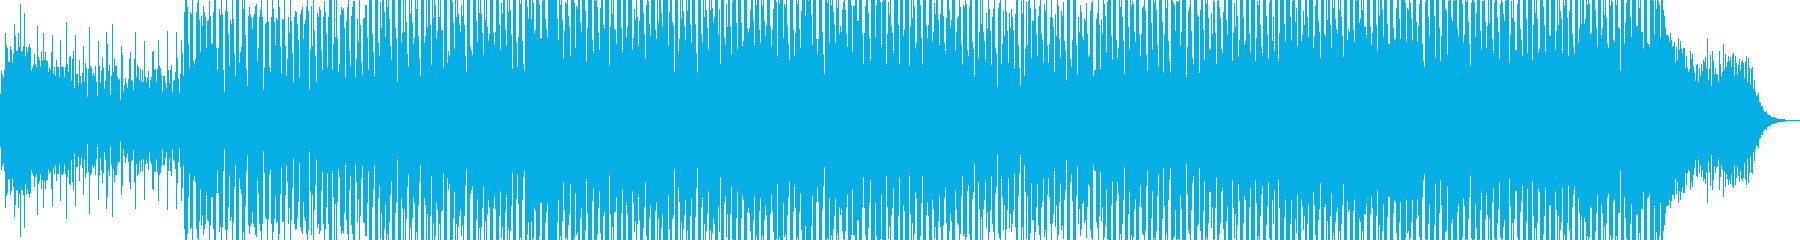 EDMポップで明るいクラブ系-86の再生済みの波形